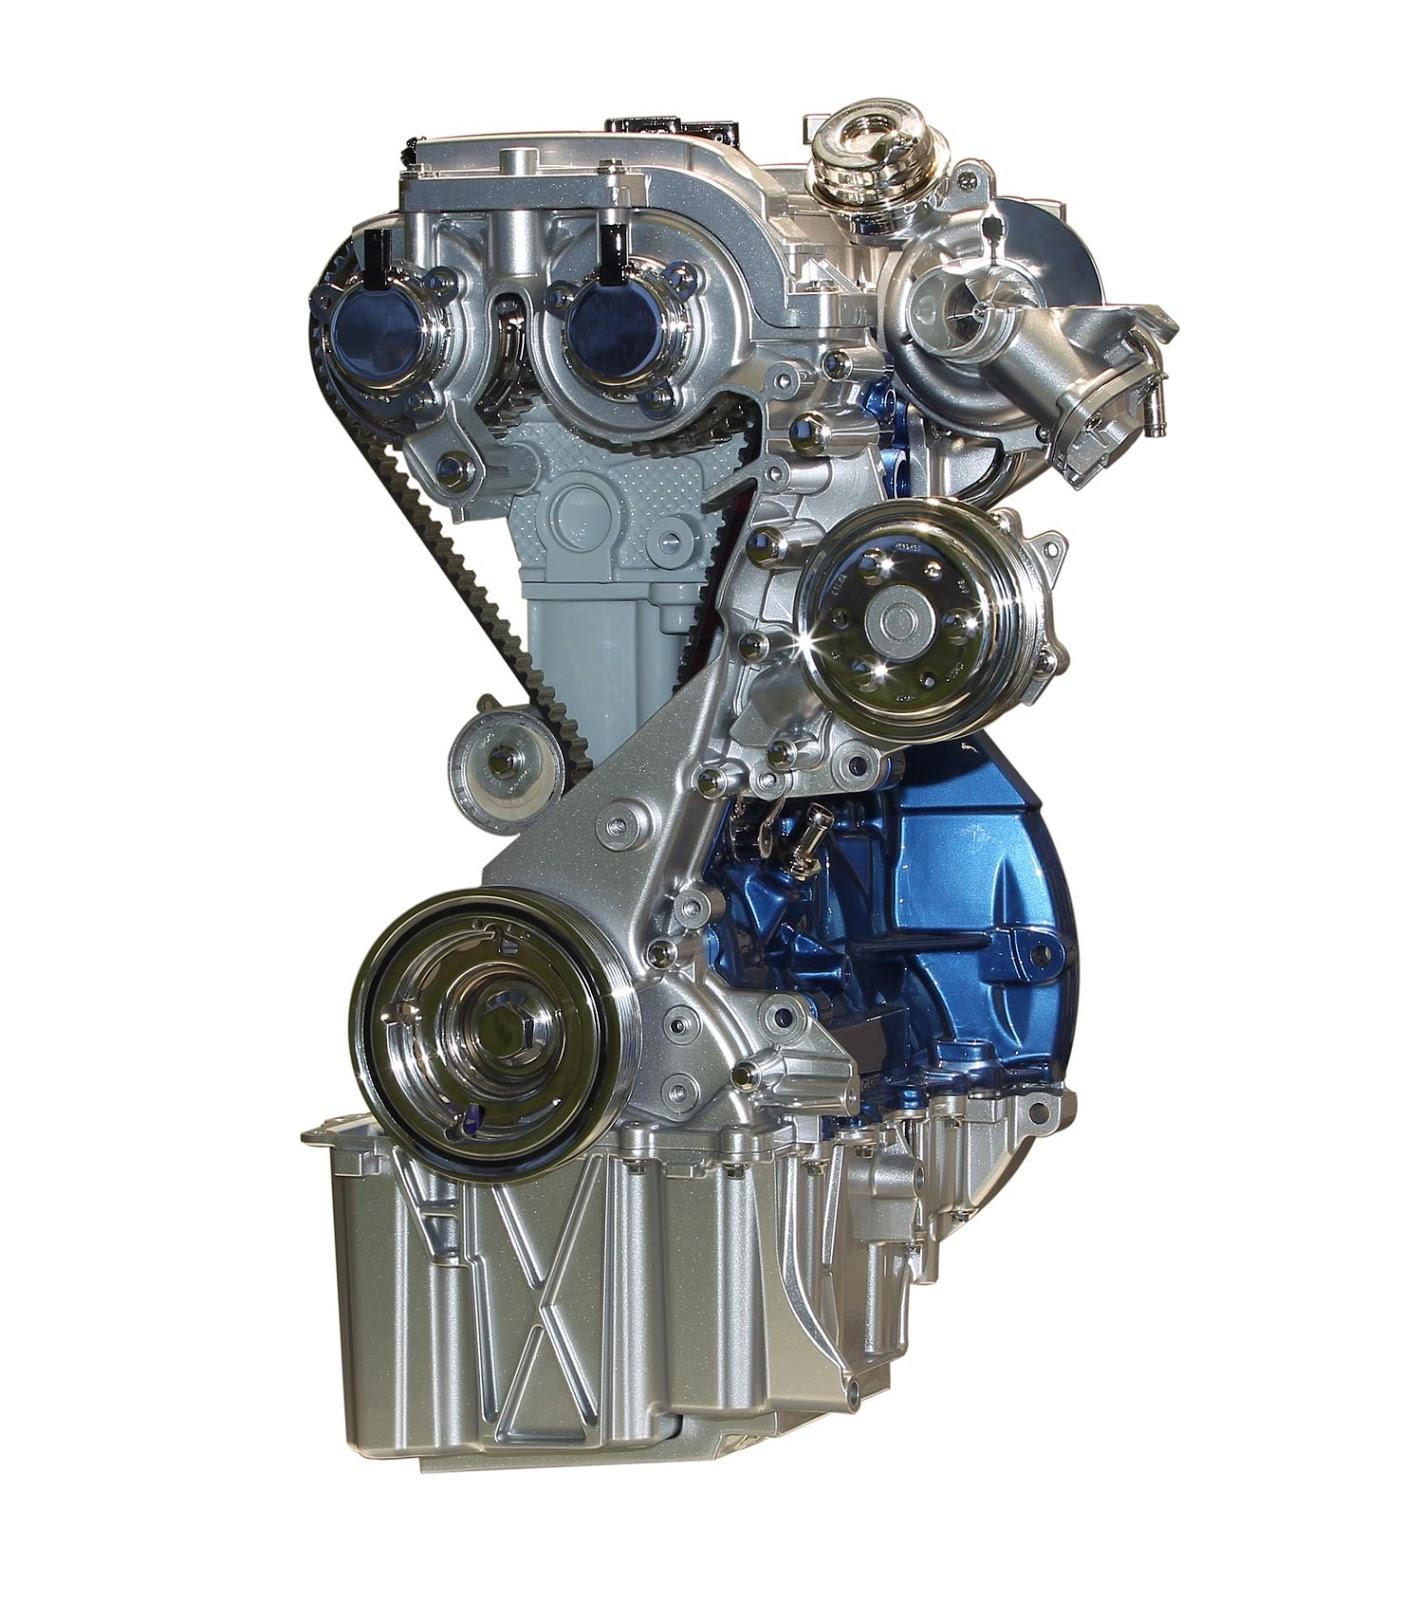 Ford Fusion 2 3 Liter Ecoboost | Autos Weblog